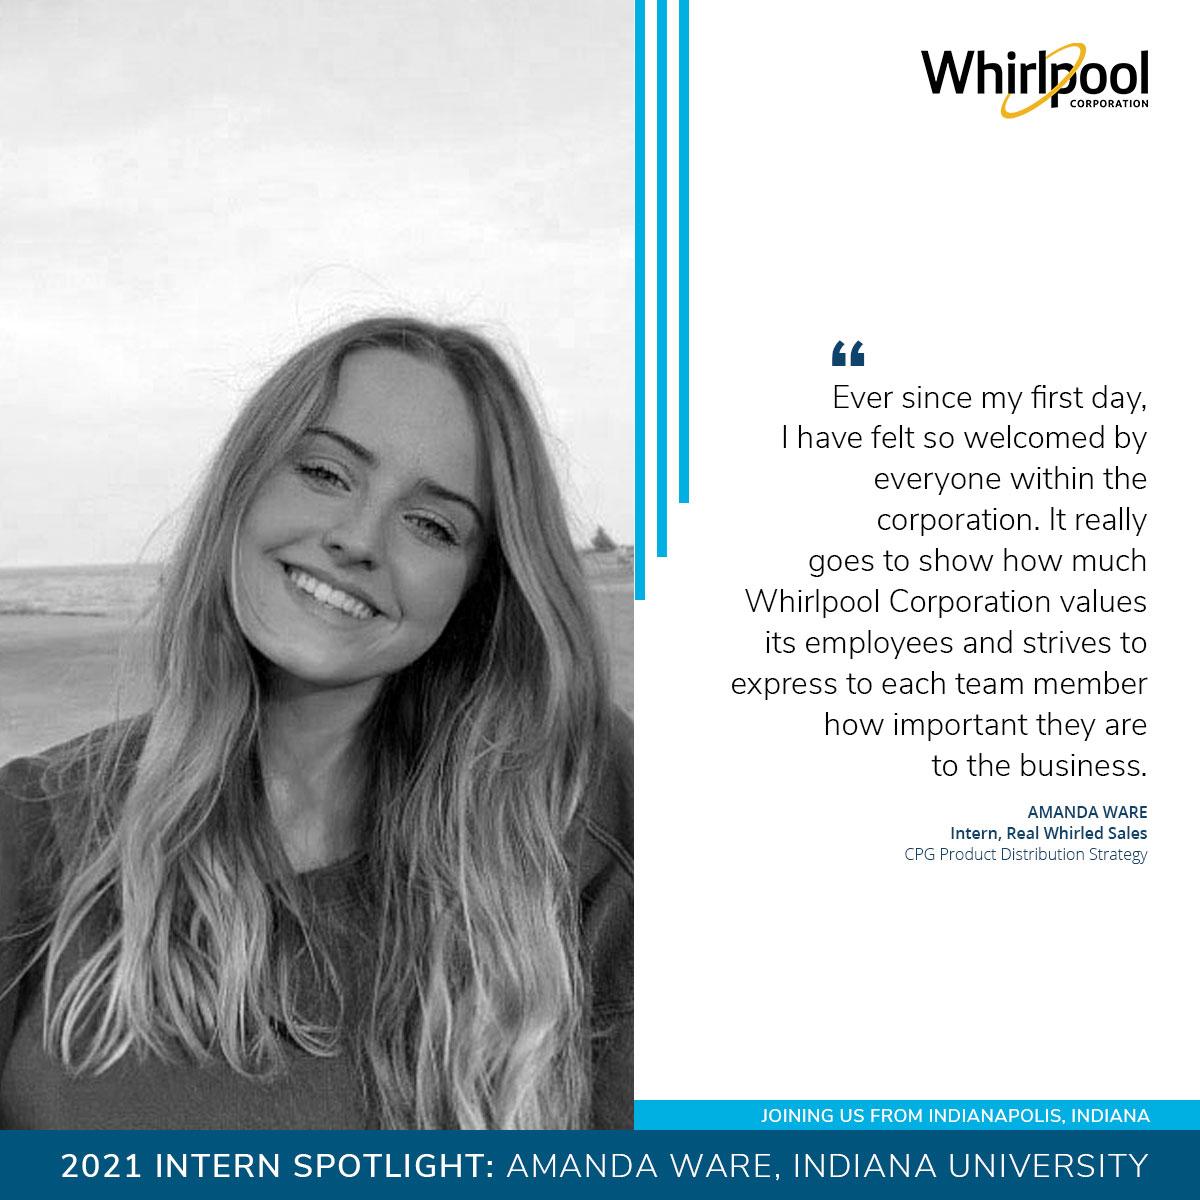 Amanda Ware, 2021 Intern at Whirlpool Corporation from Indiana University